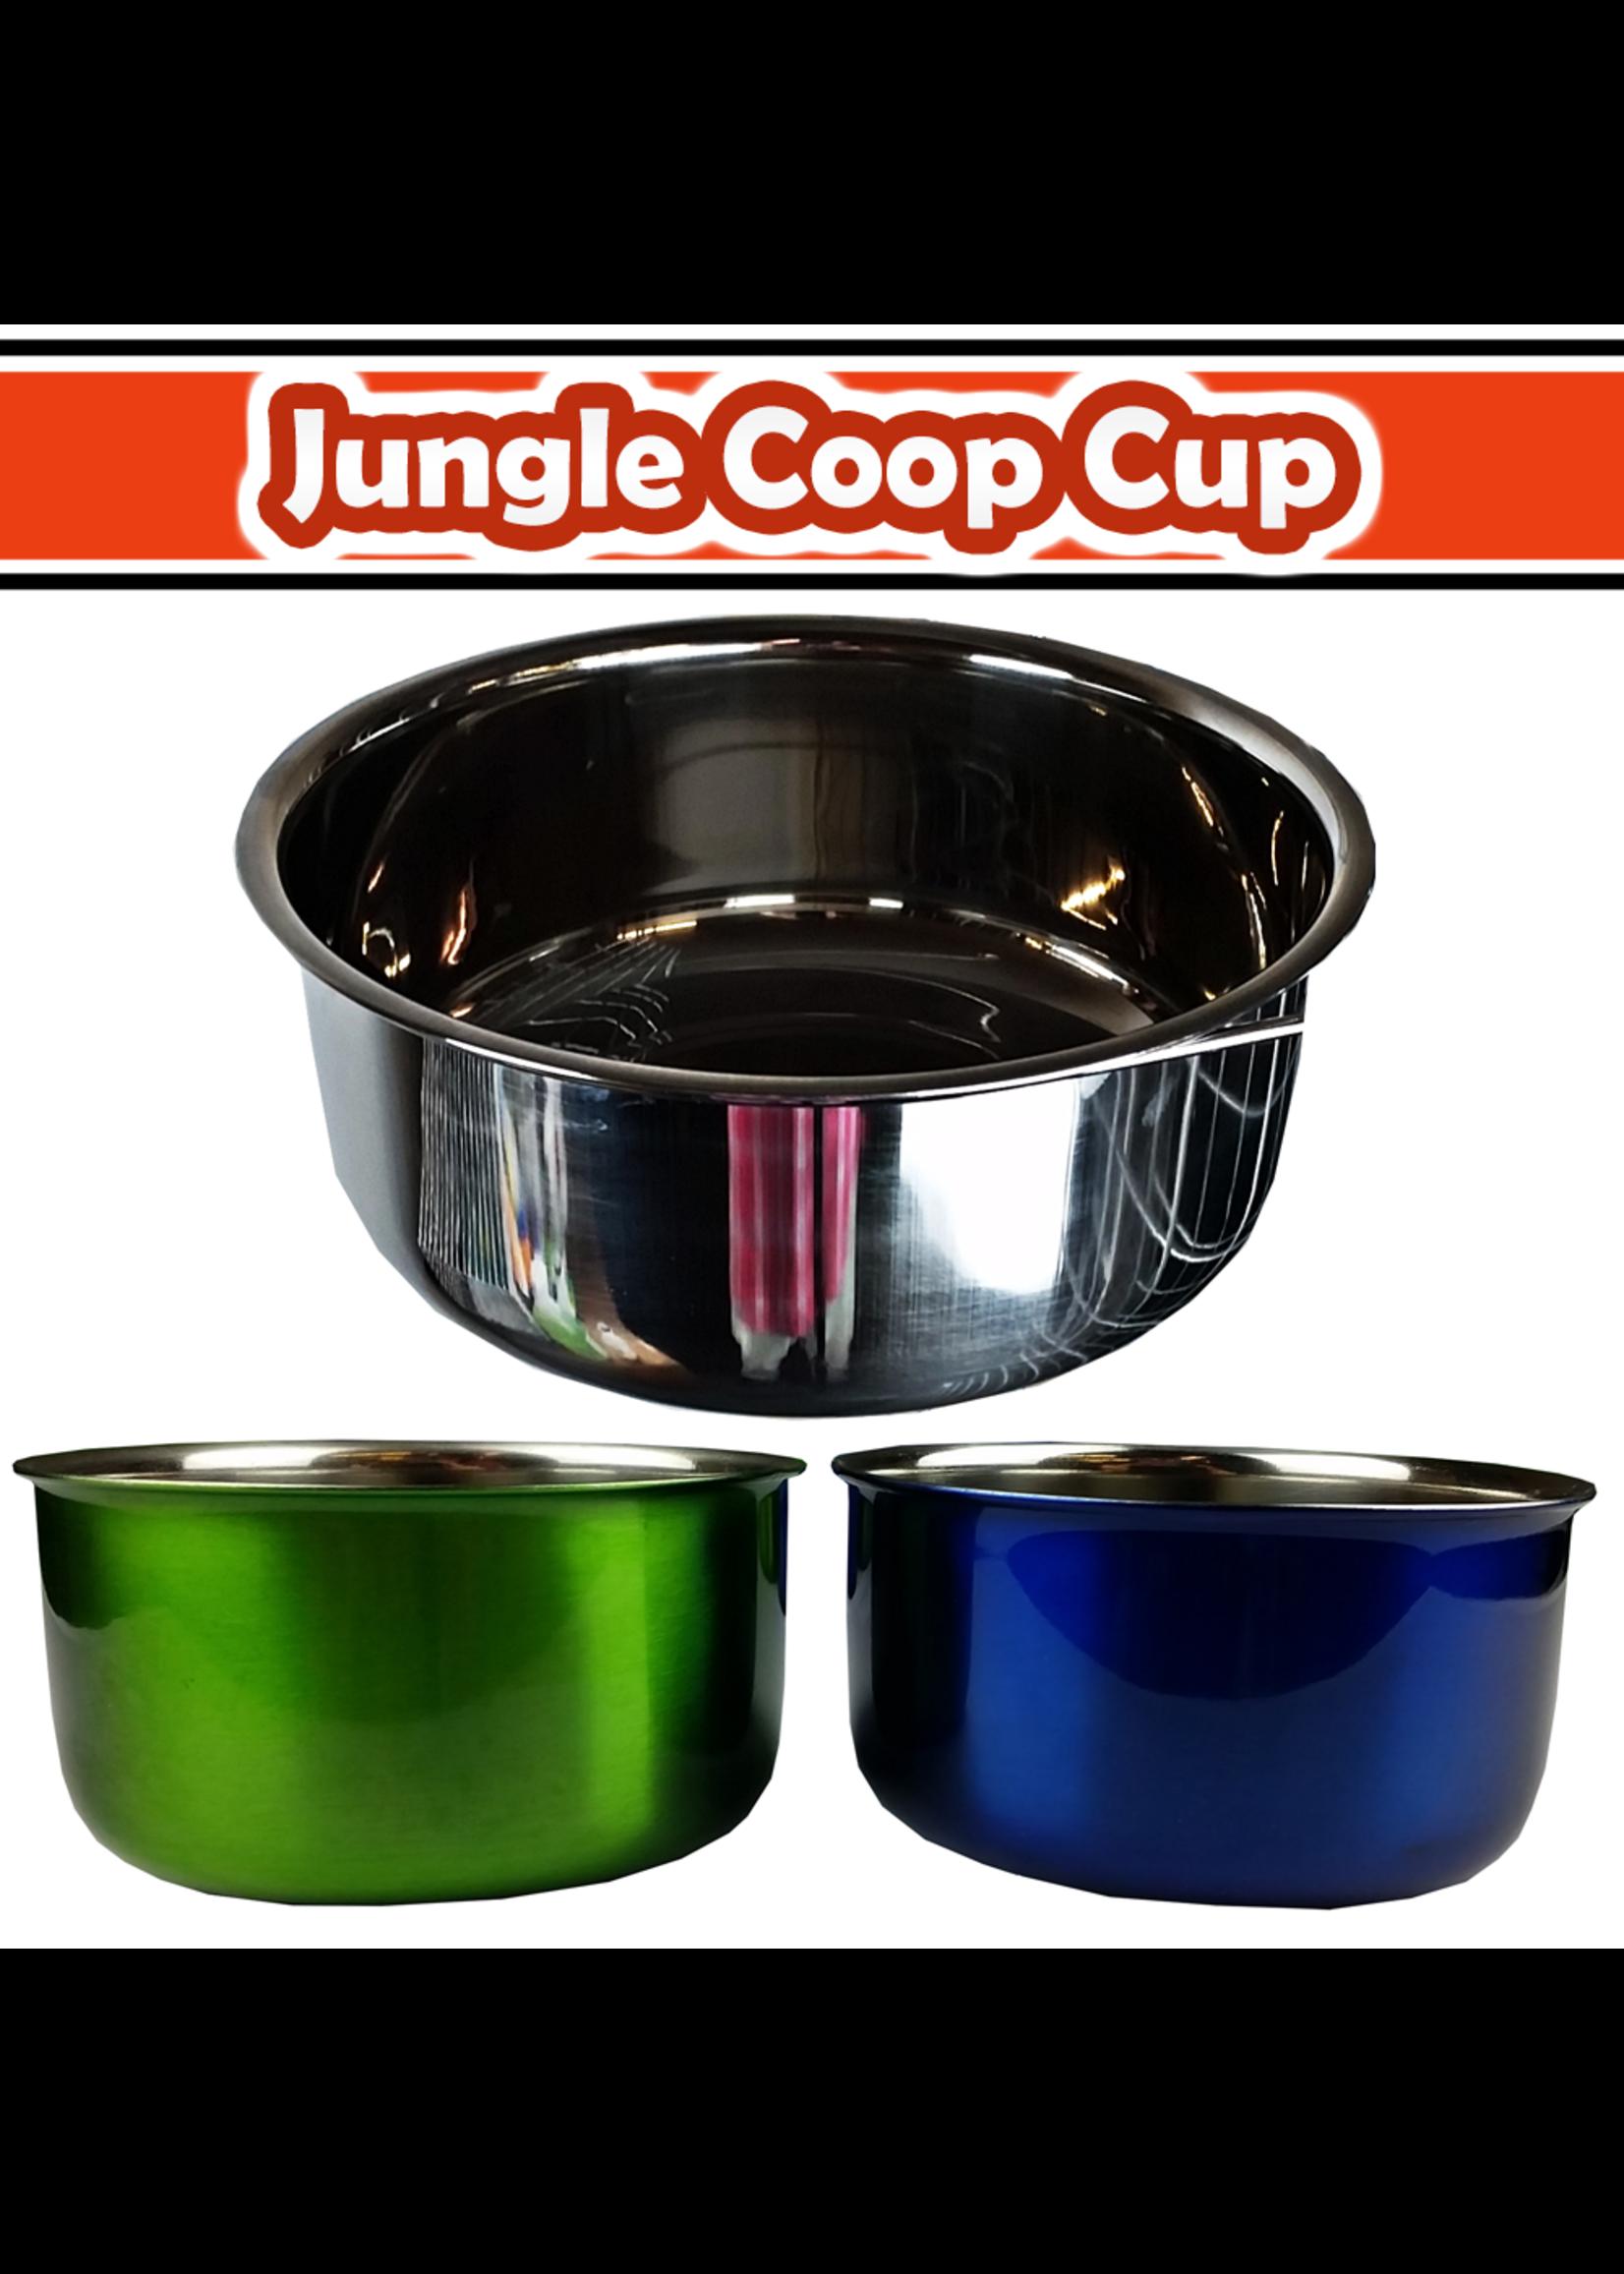 A&E Jungle Cups Bolt On Coop Cup 10 oz